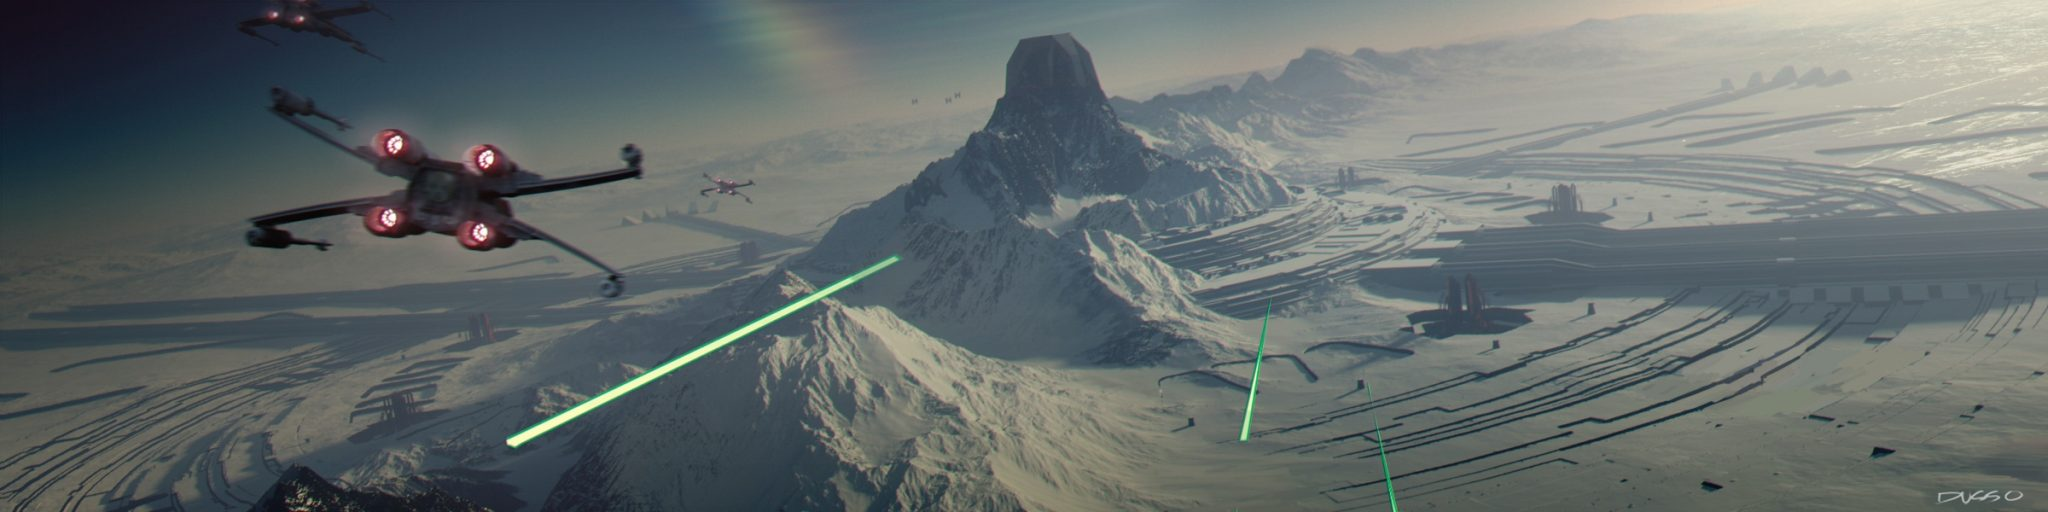 concept-art-dusseault-star-wars-ice-planet-fighter